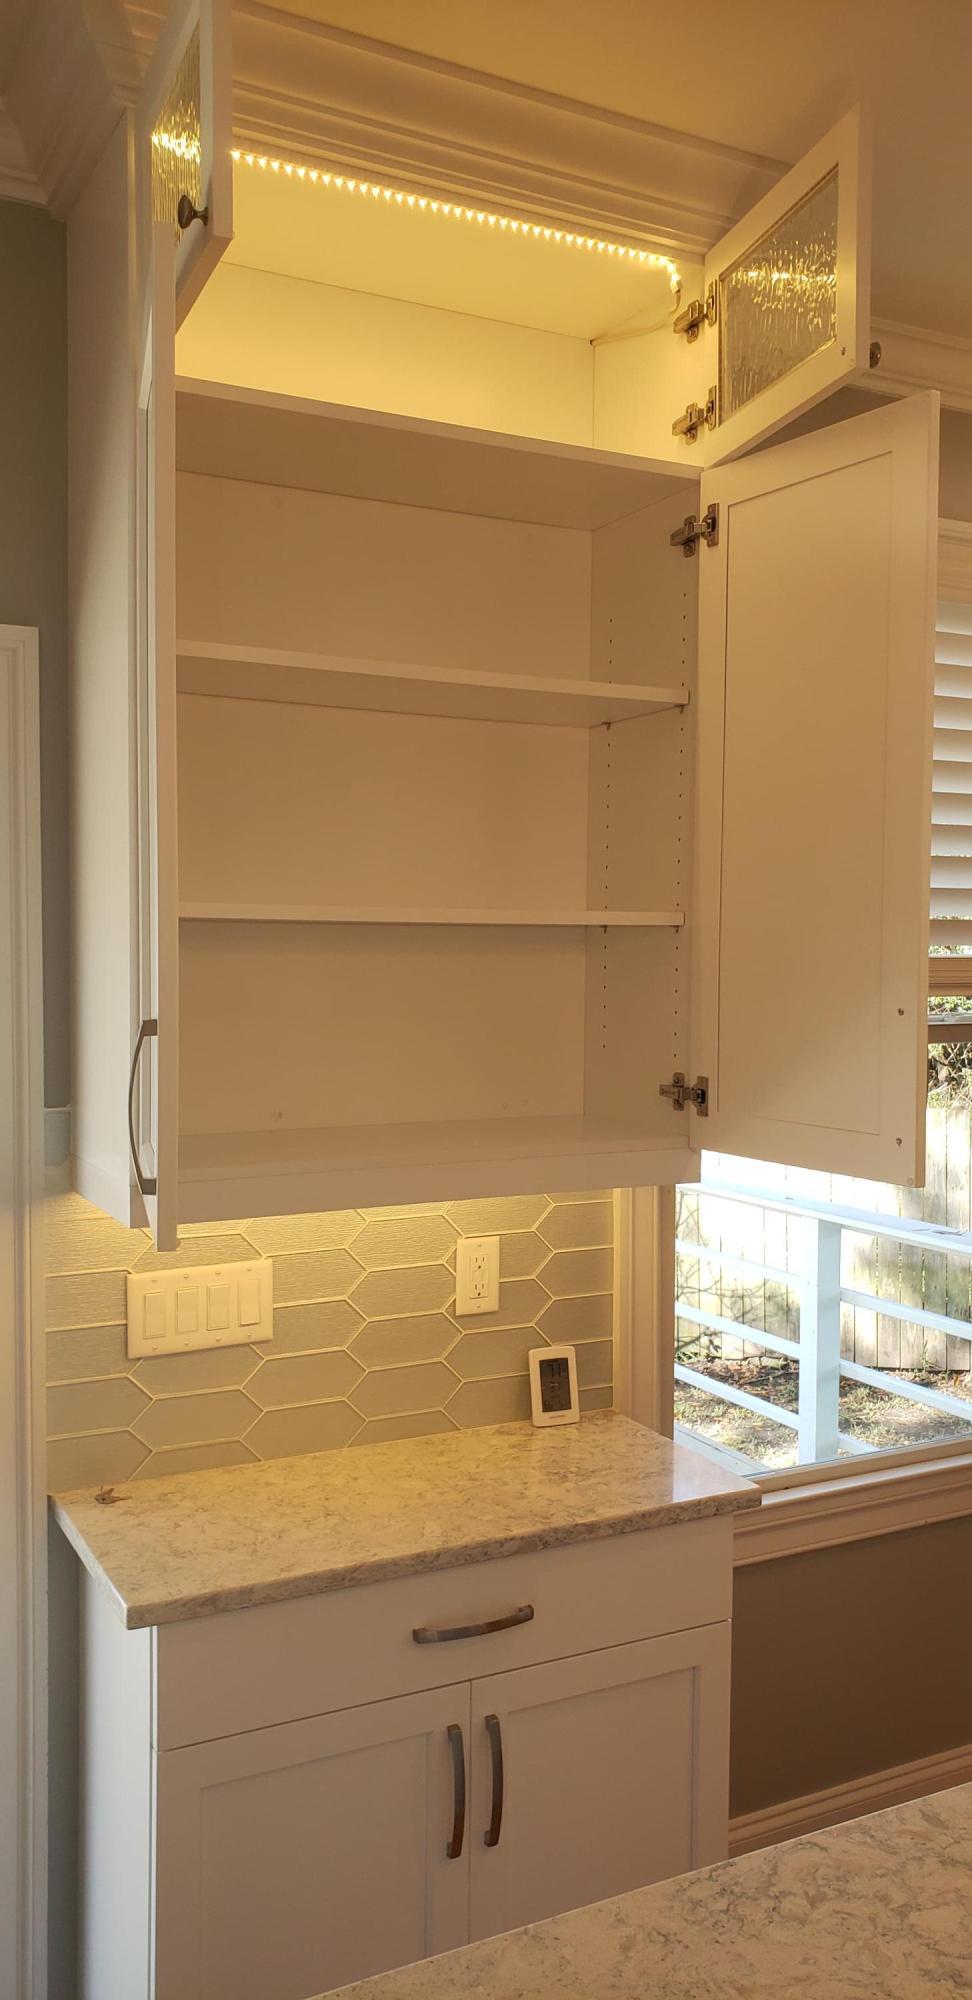 Laurel Lakes Homes For Sale - 1305 Woodlock, Mount Pleasant, SC - 8